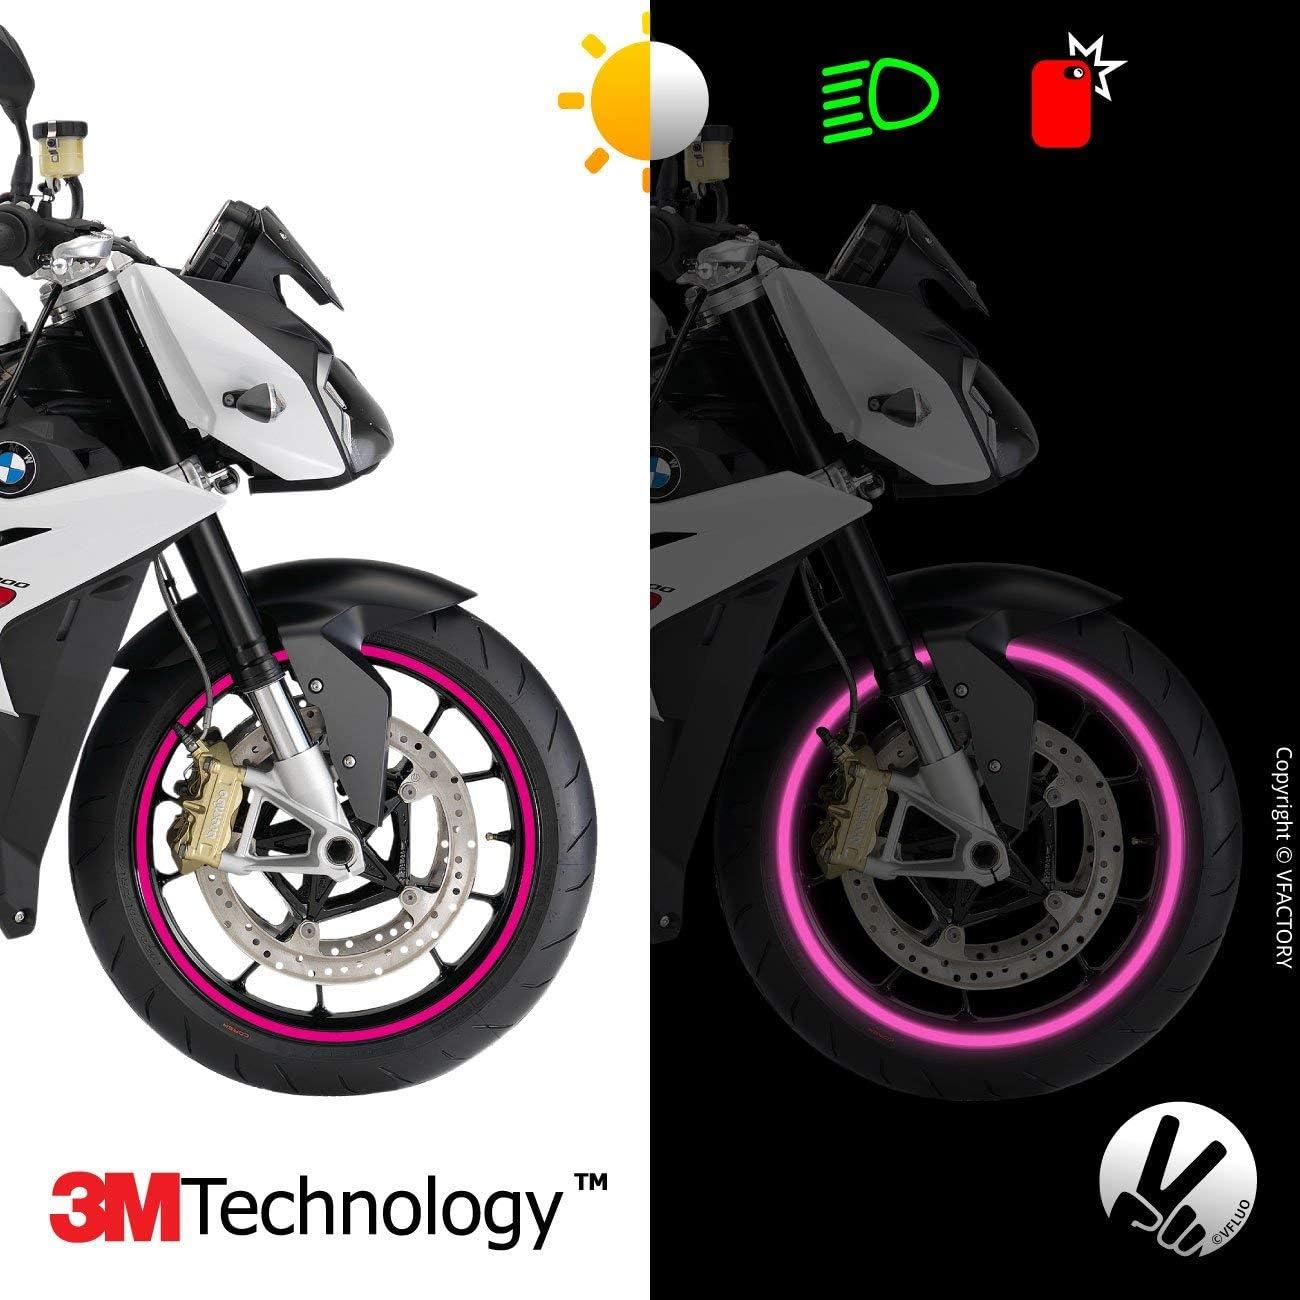 1 wheel 3M Technology VFLUO CIRCULAR motorbike retro reflective wheel stripes kit 7 mm width Yellow